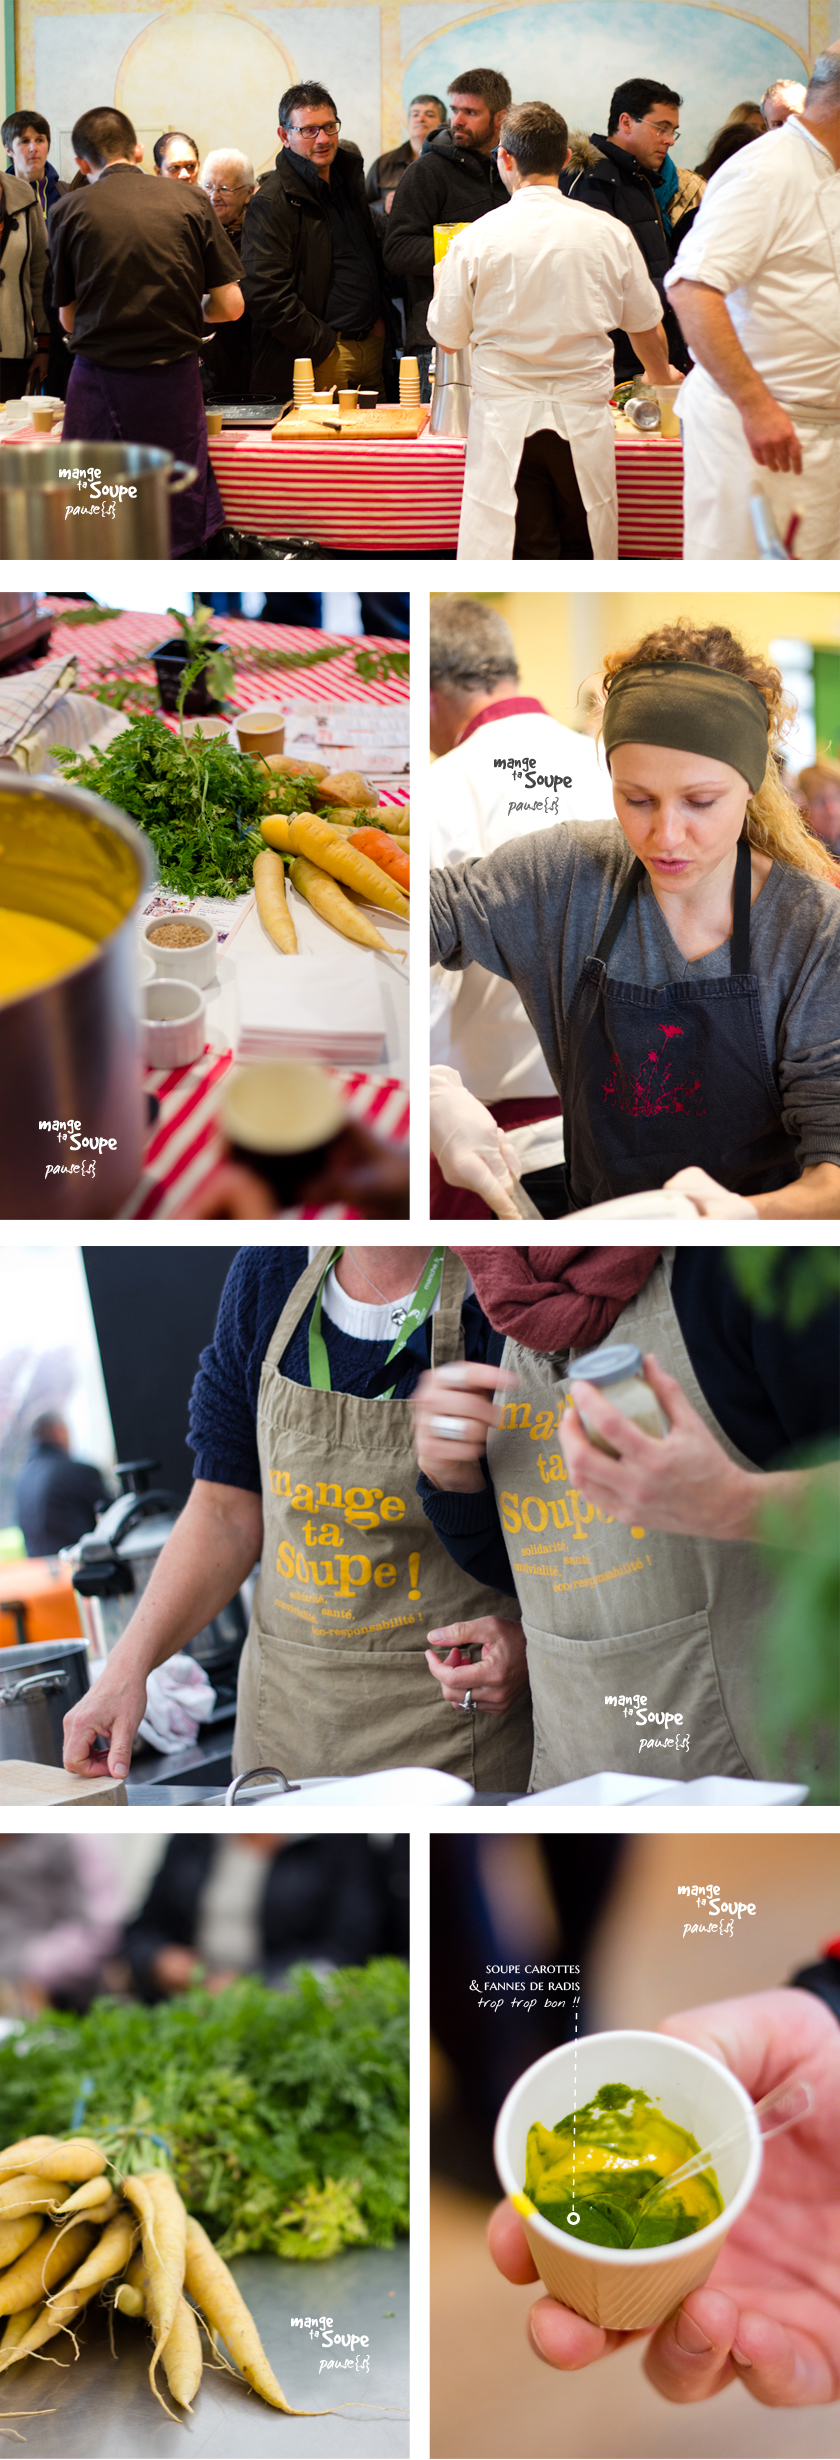 Mange-ta-soupe2015-2